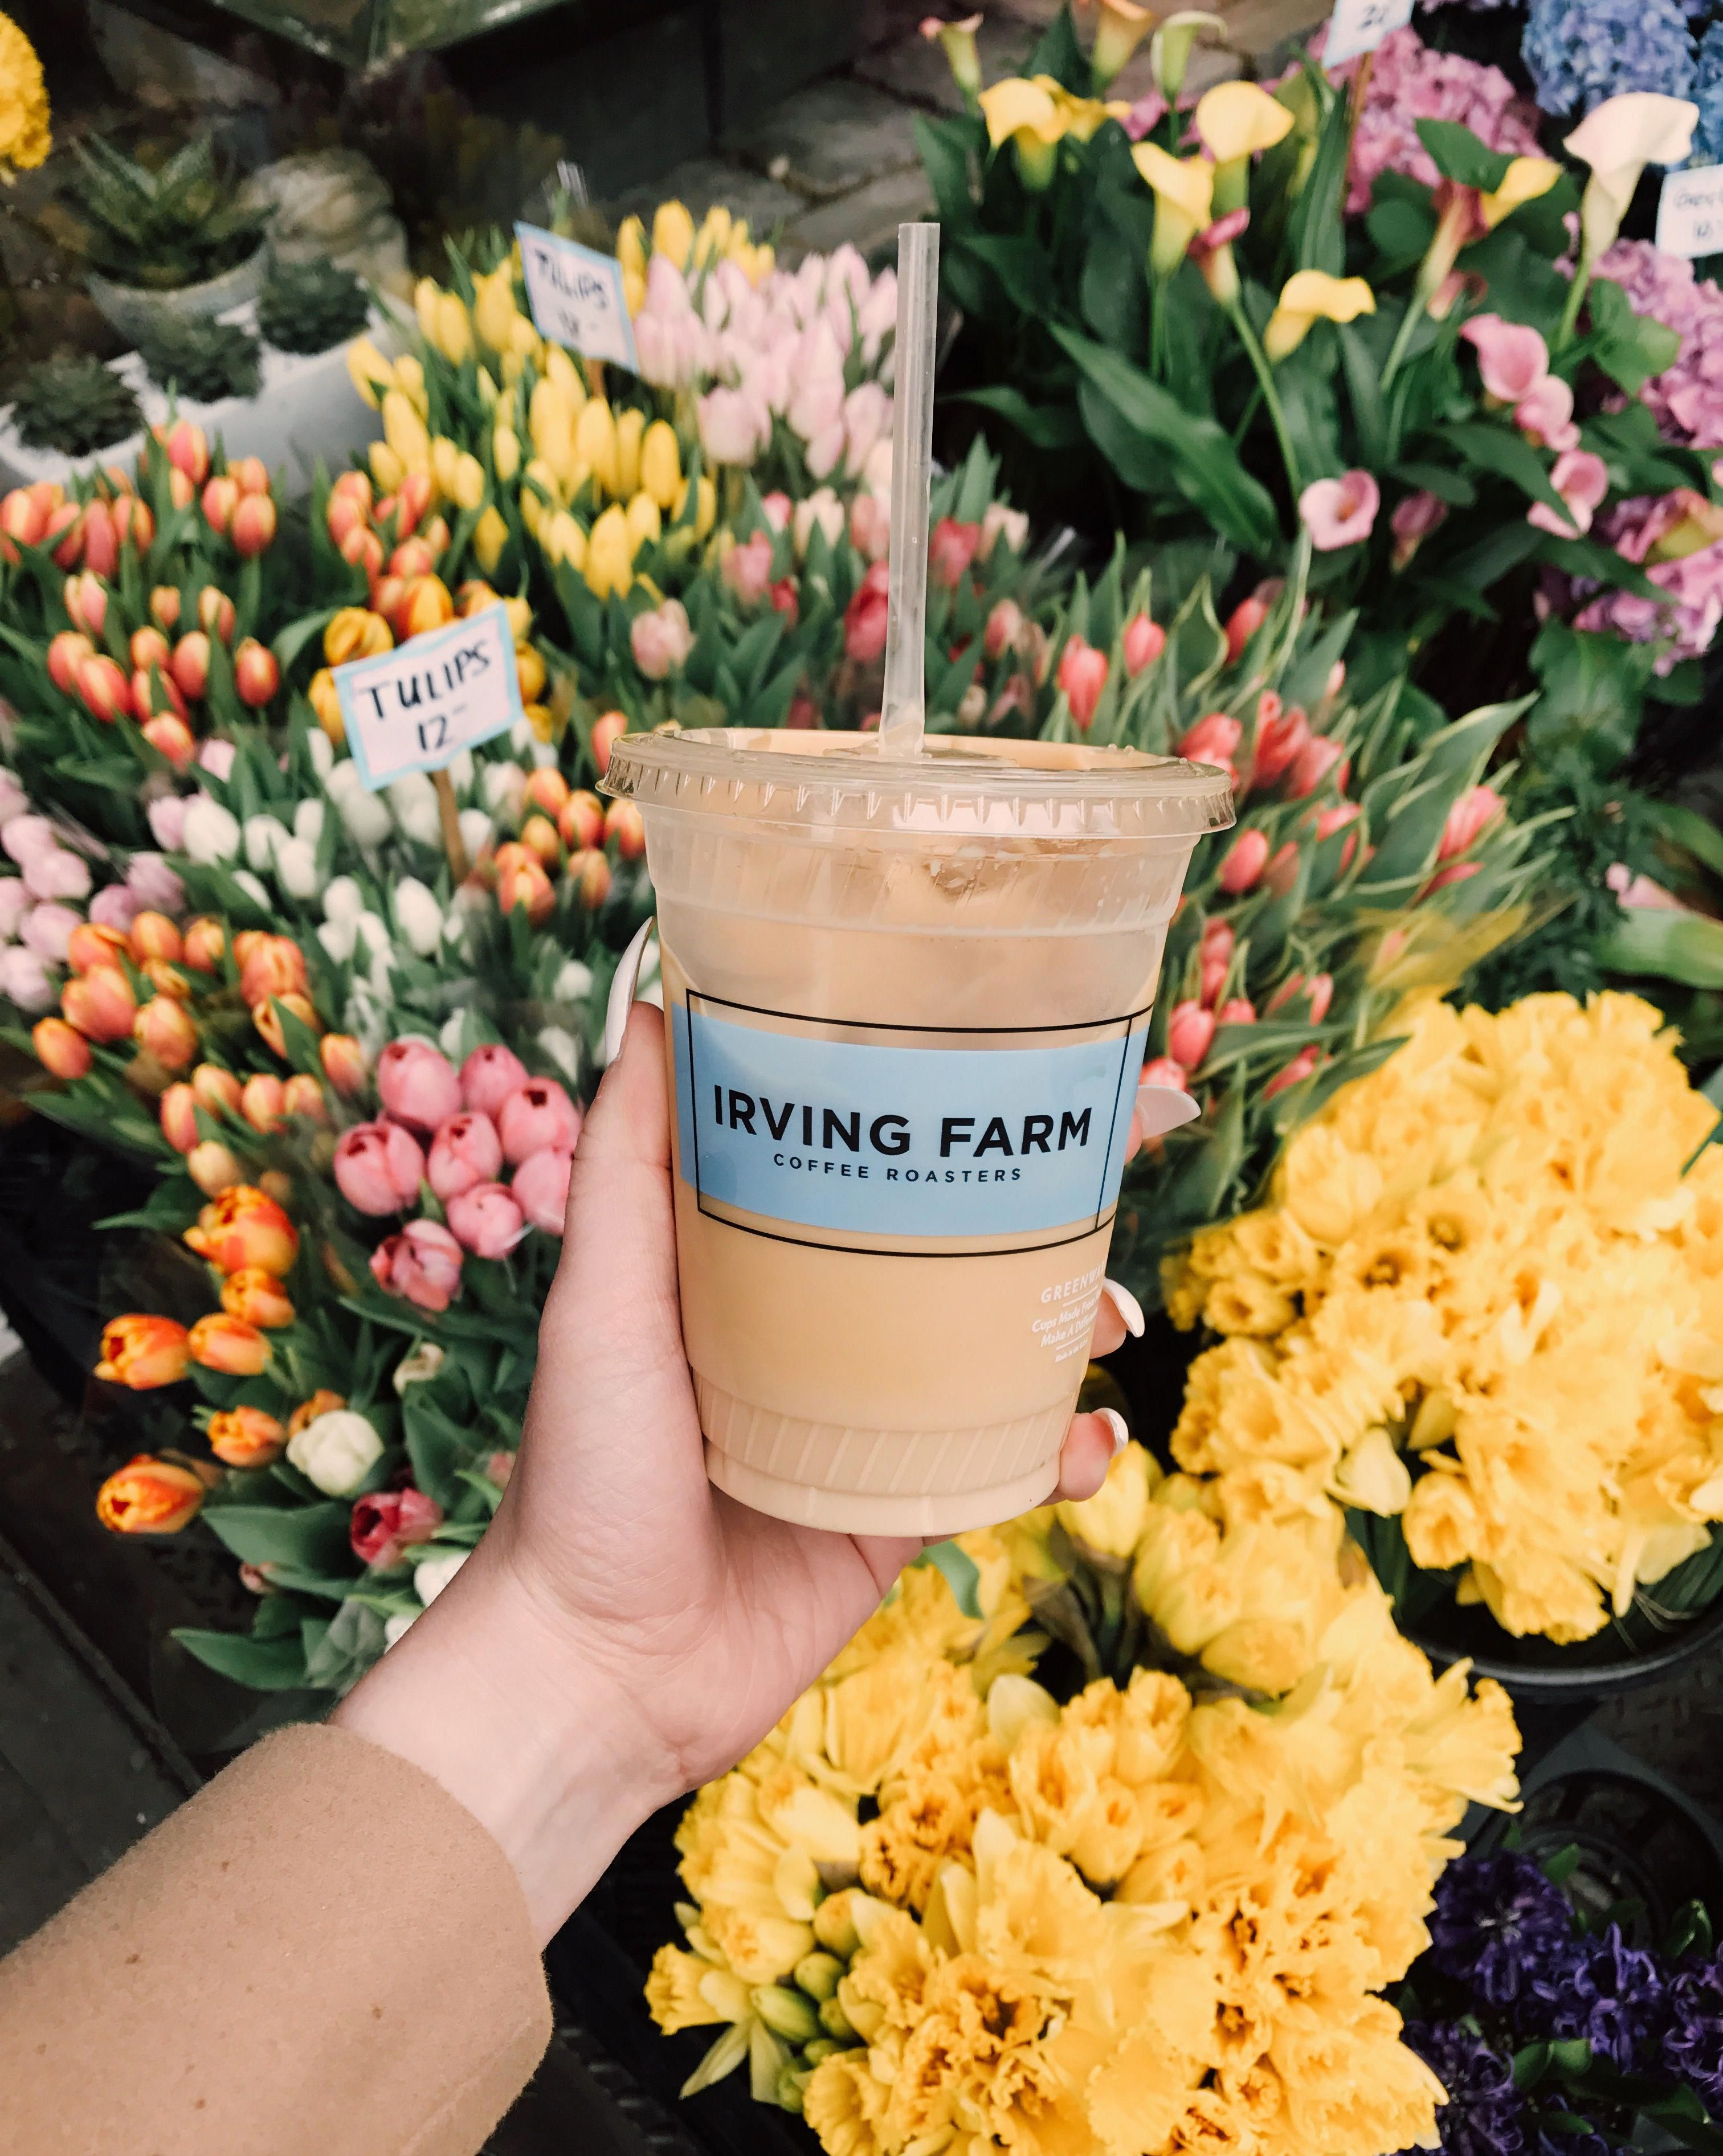 Iced latte irving farm coffee roasters upper west side